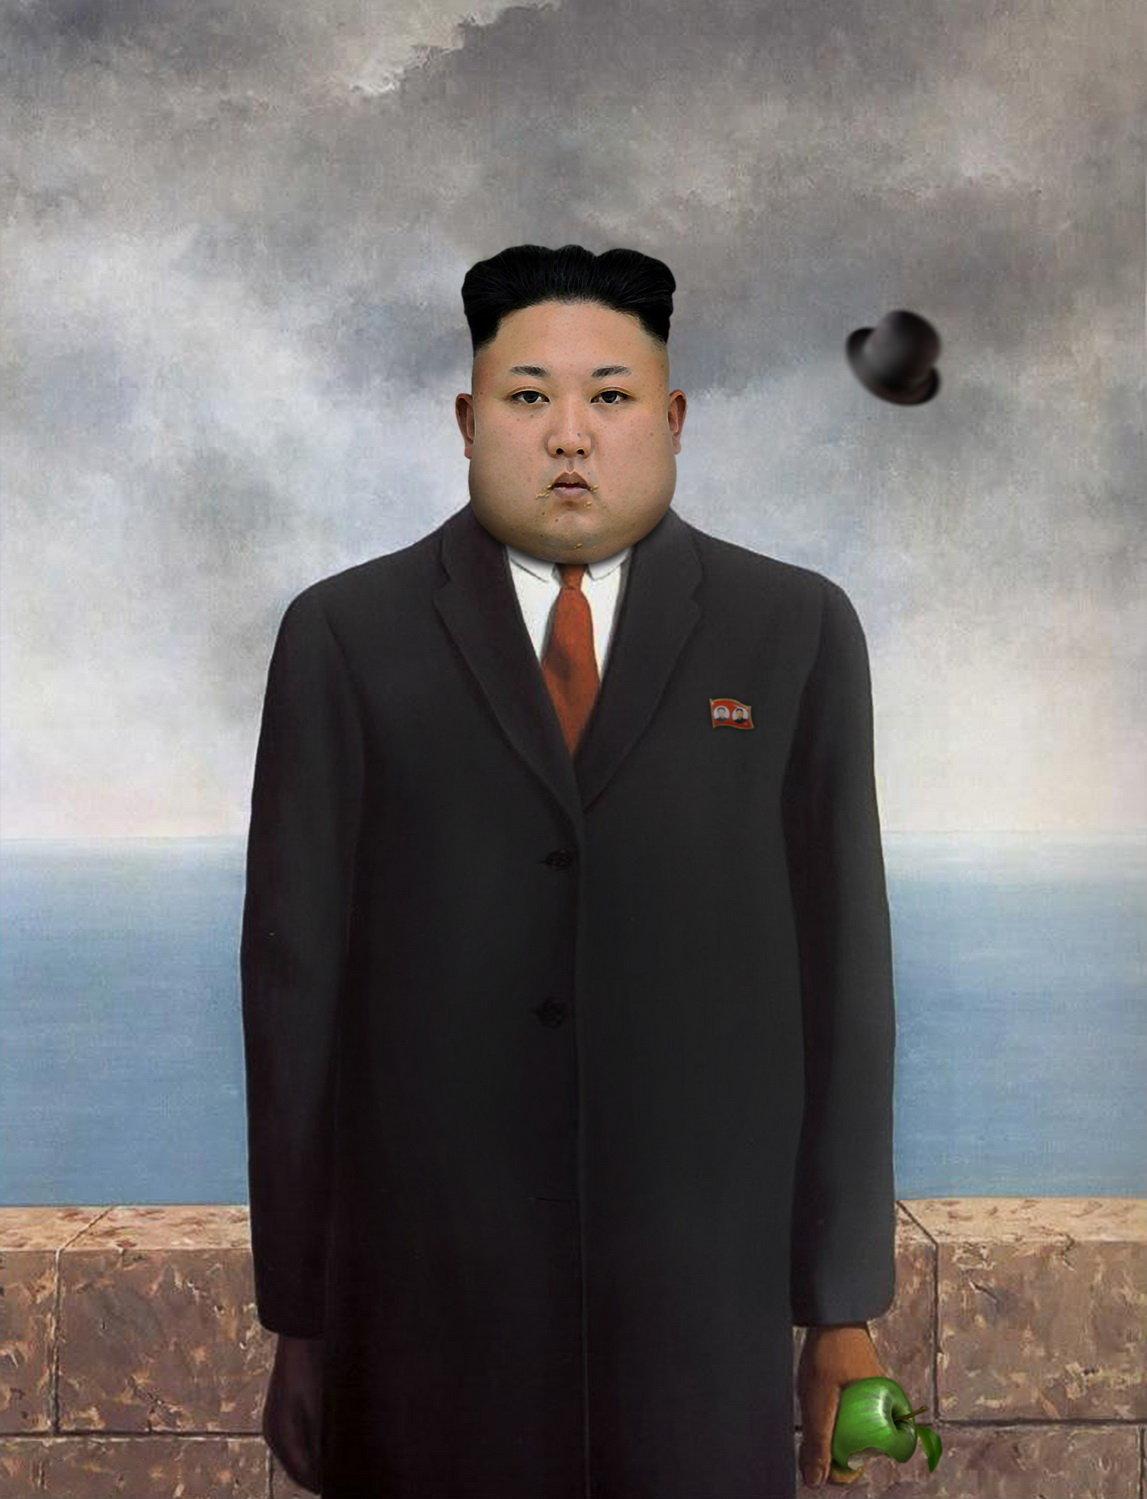 Fils de Jong Un